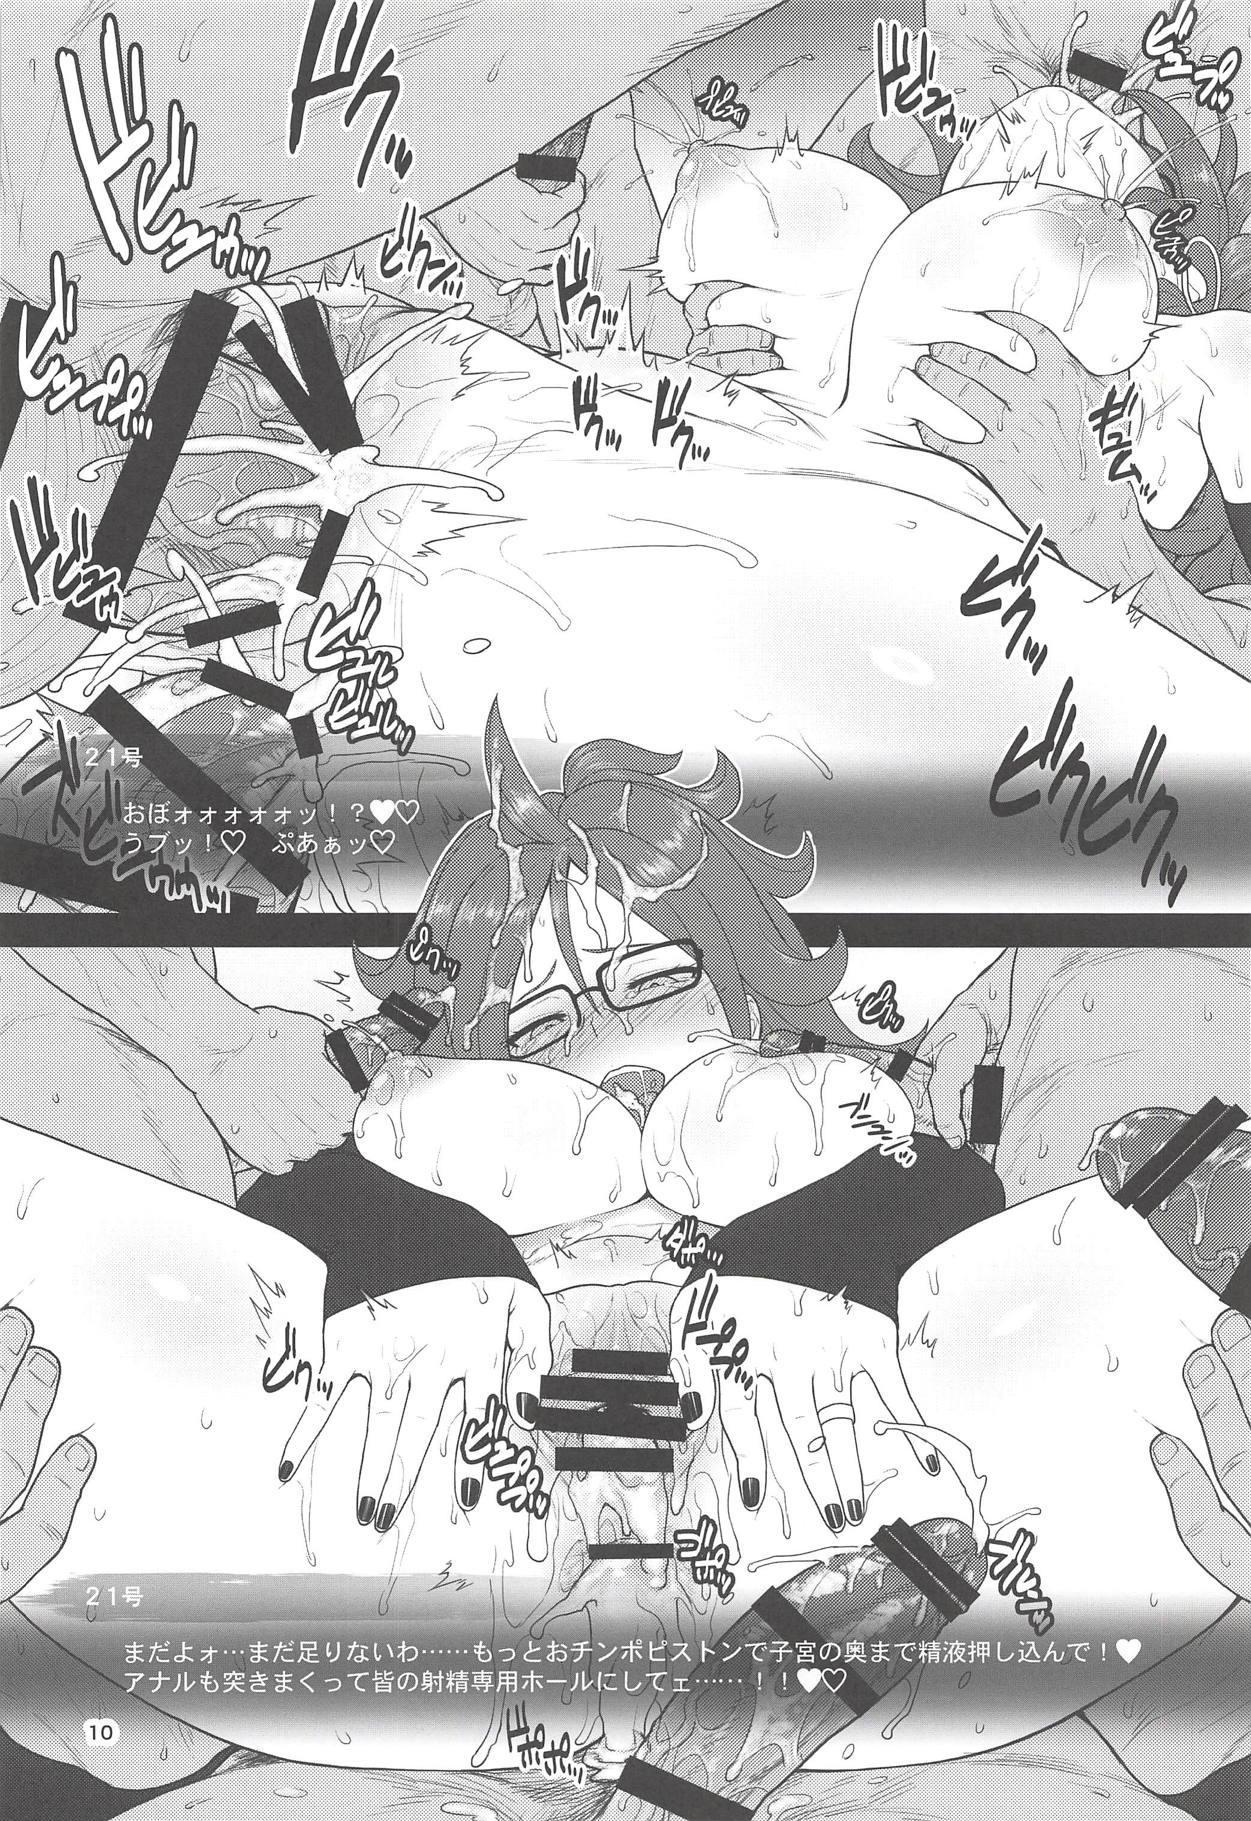 (C94) [Shinnihon Pepsitou (St.germain-sal)] 1-tsubu de 2-do Oishii (Dragon Ball FighterZ) 8